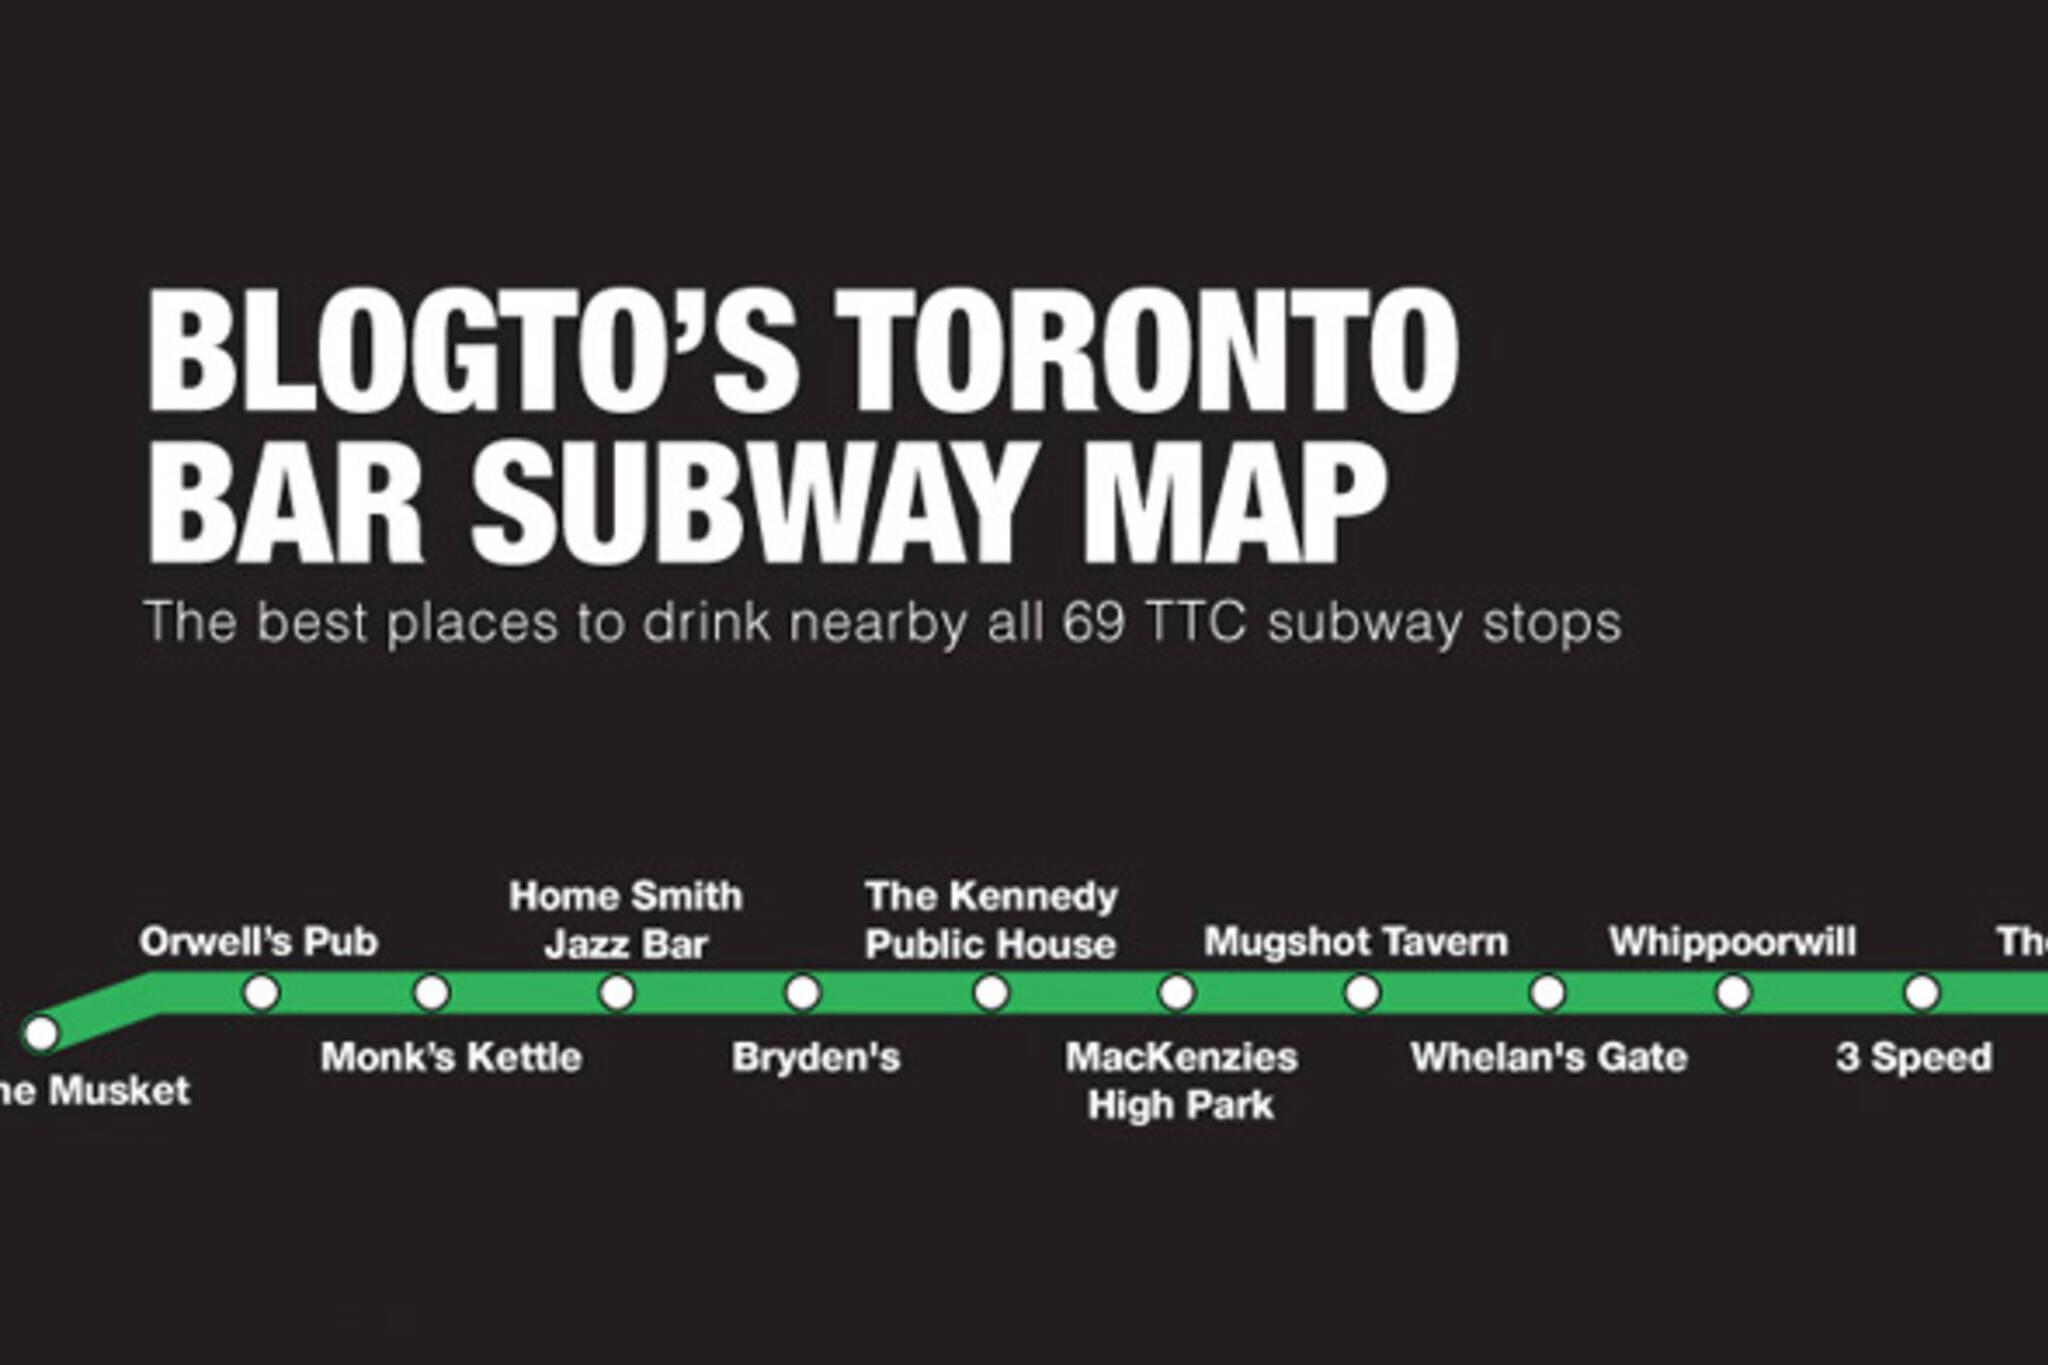 toronto bar subway map